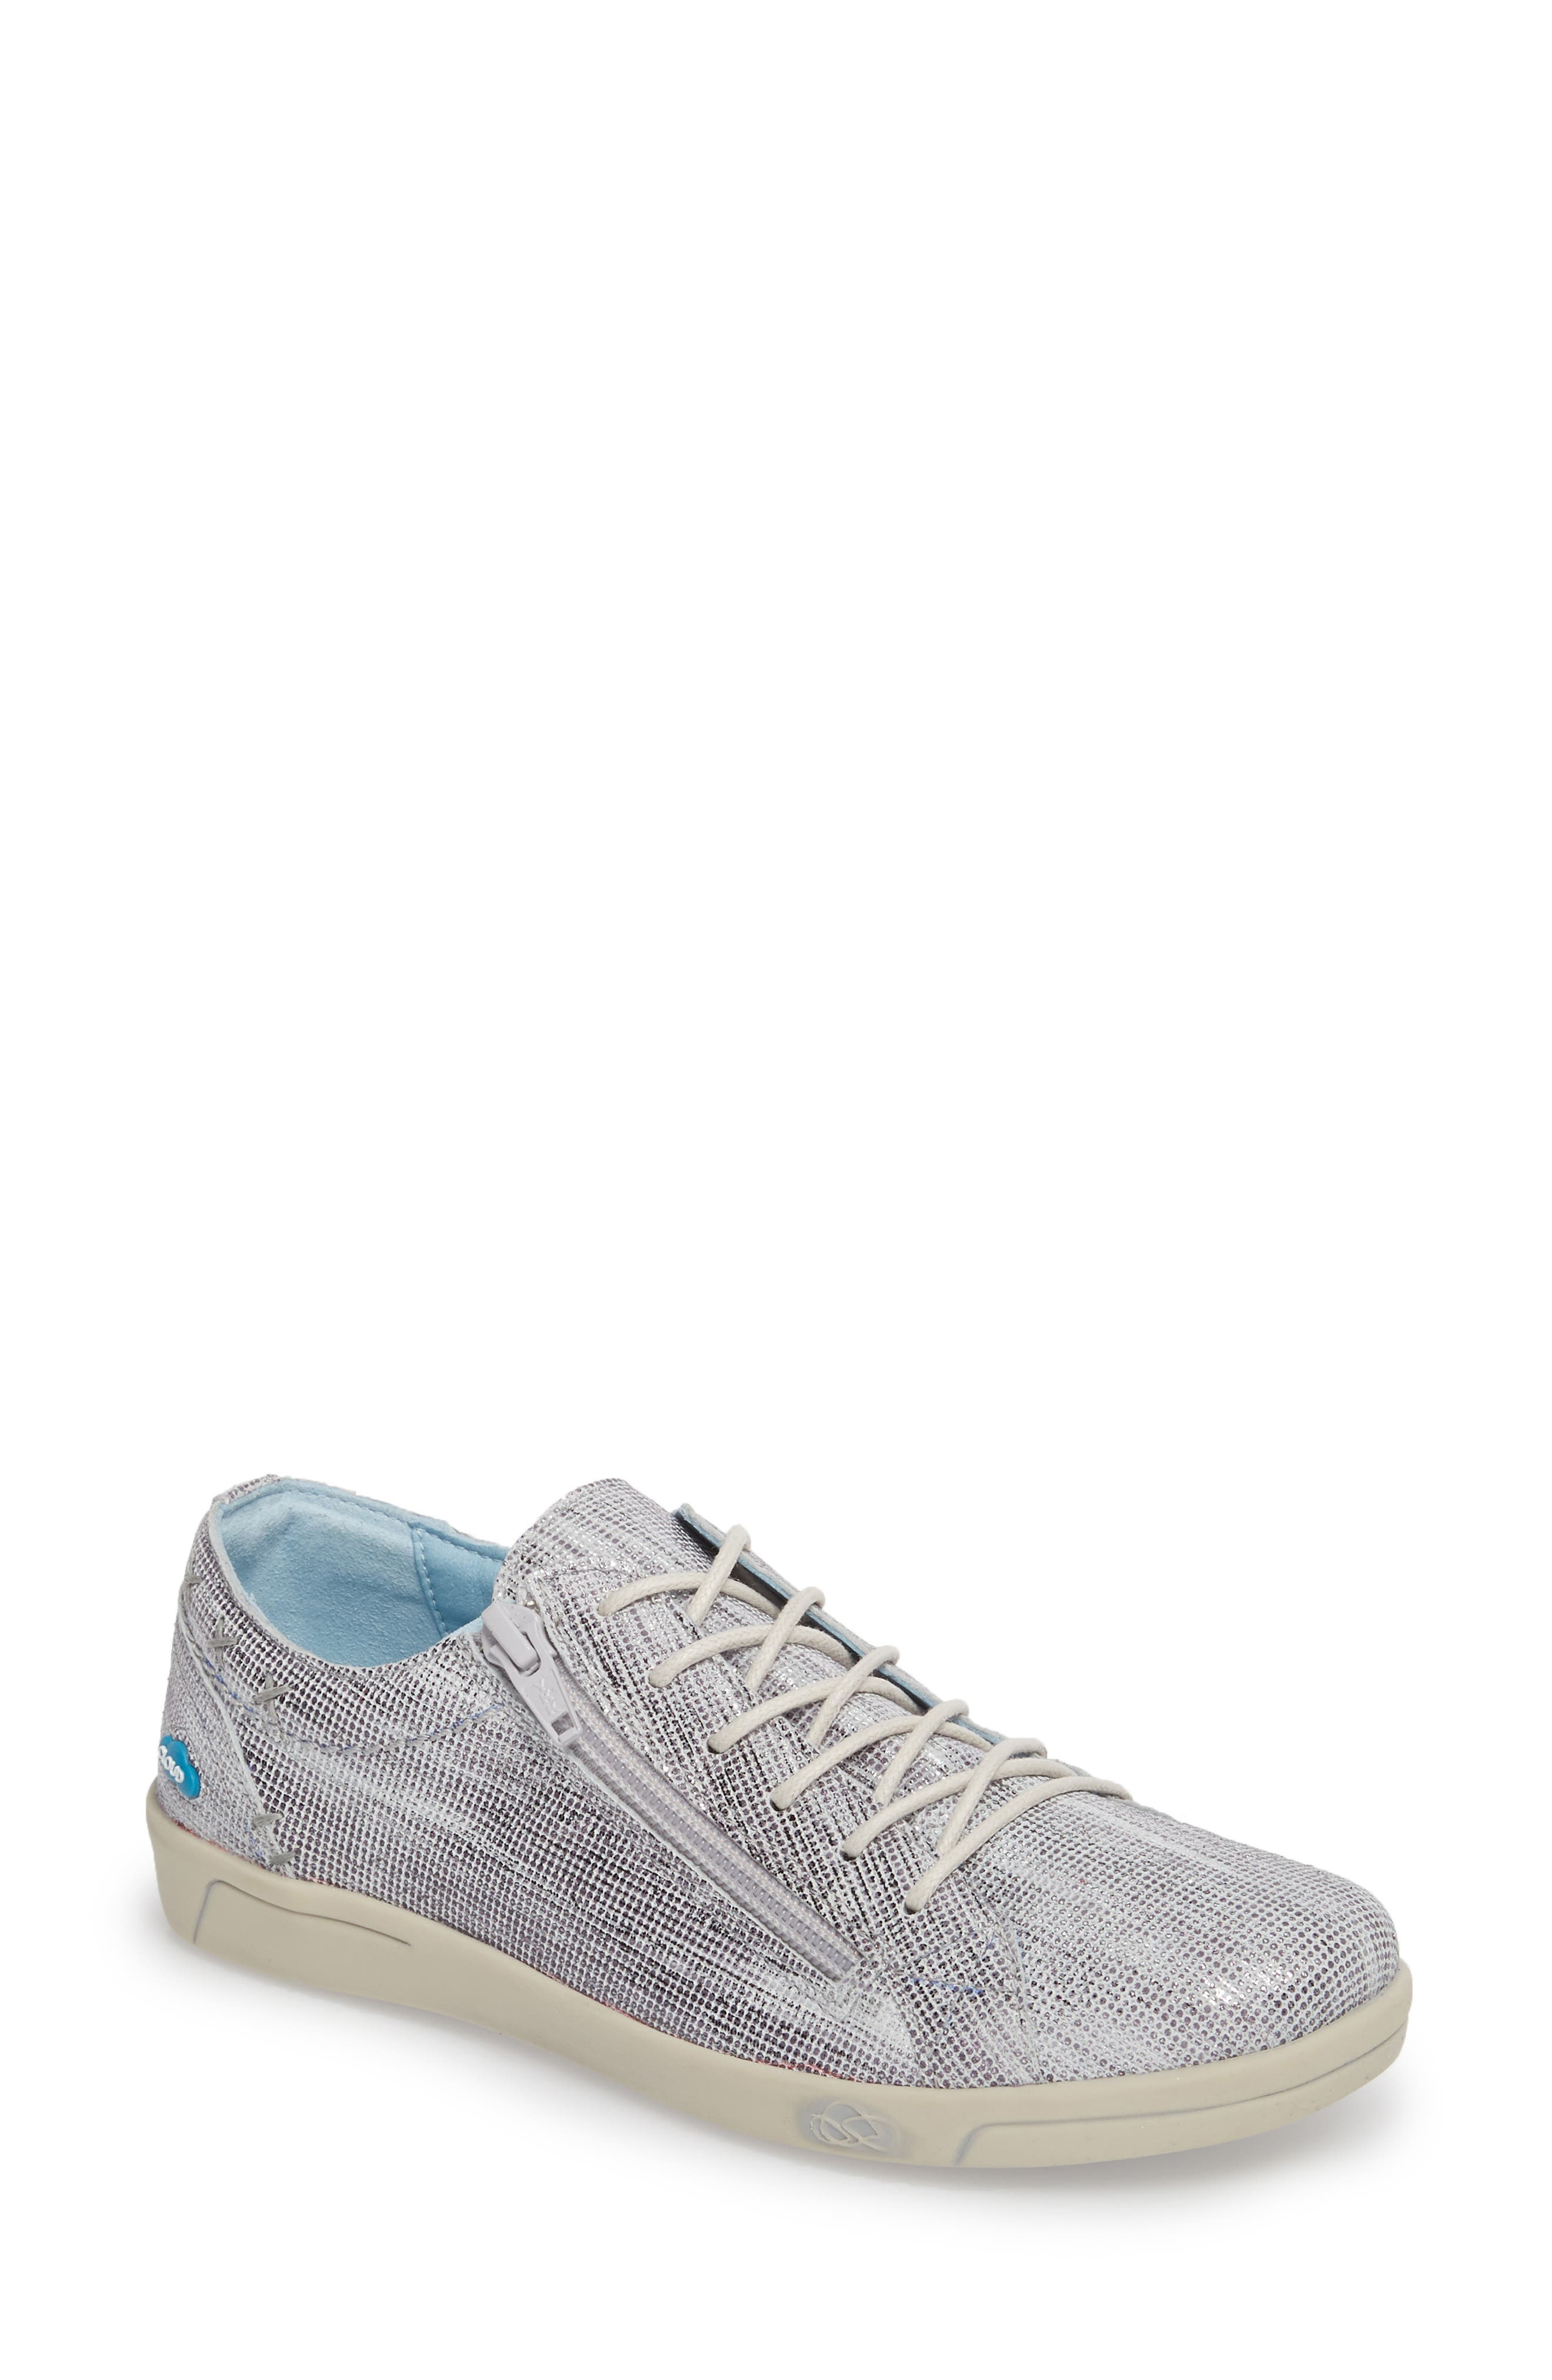 Aika Dunkan Sneaker,                         Main,                         color, Grey Leather